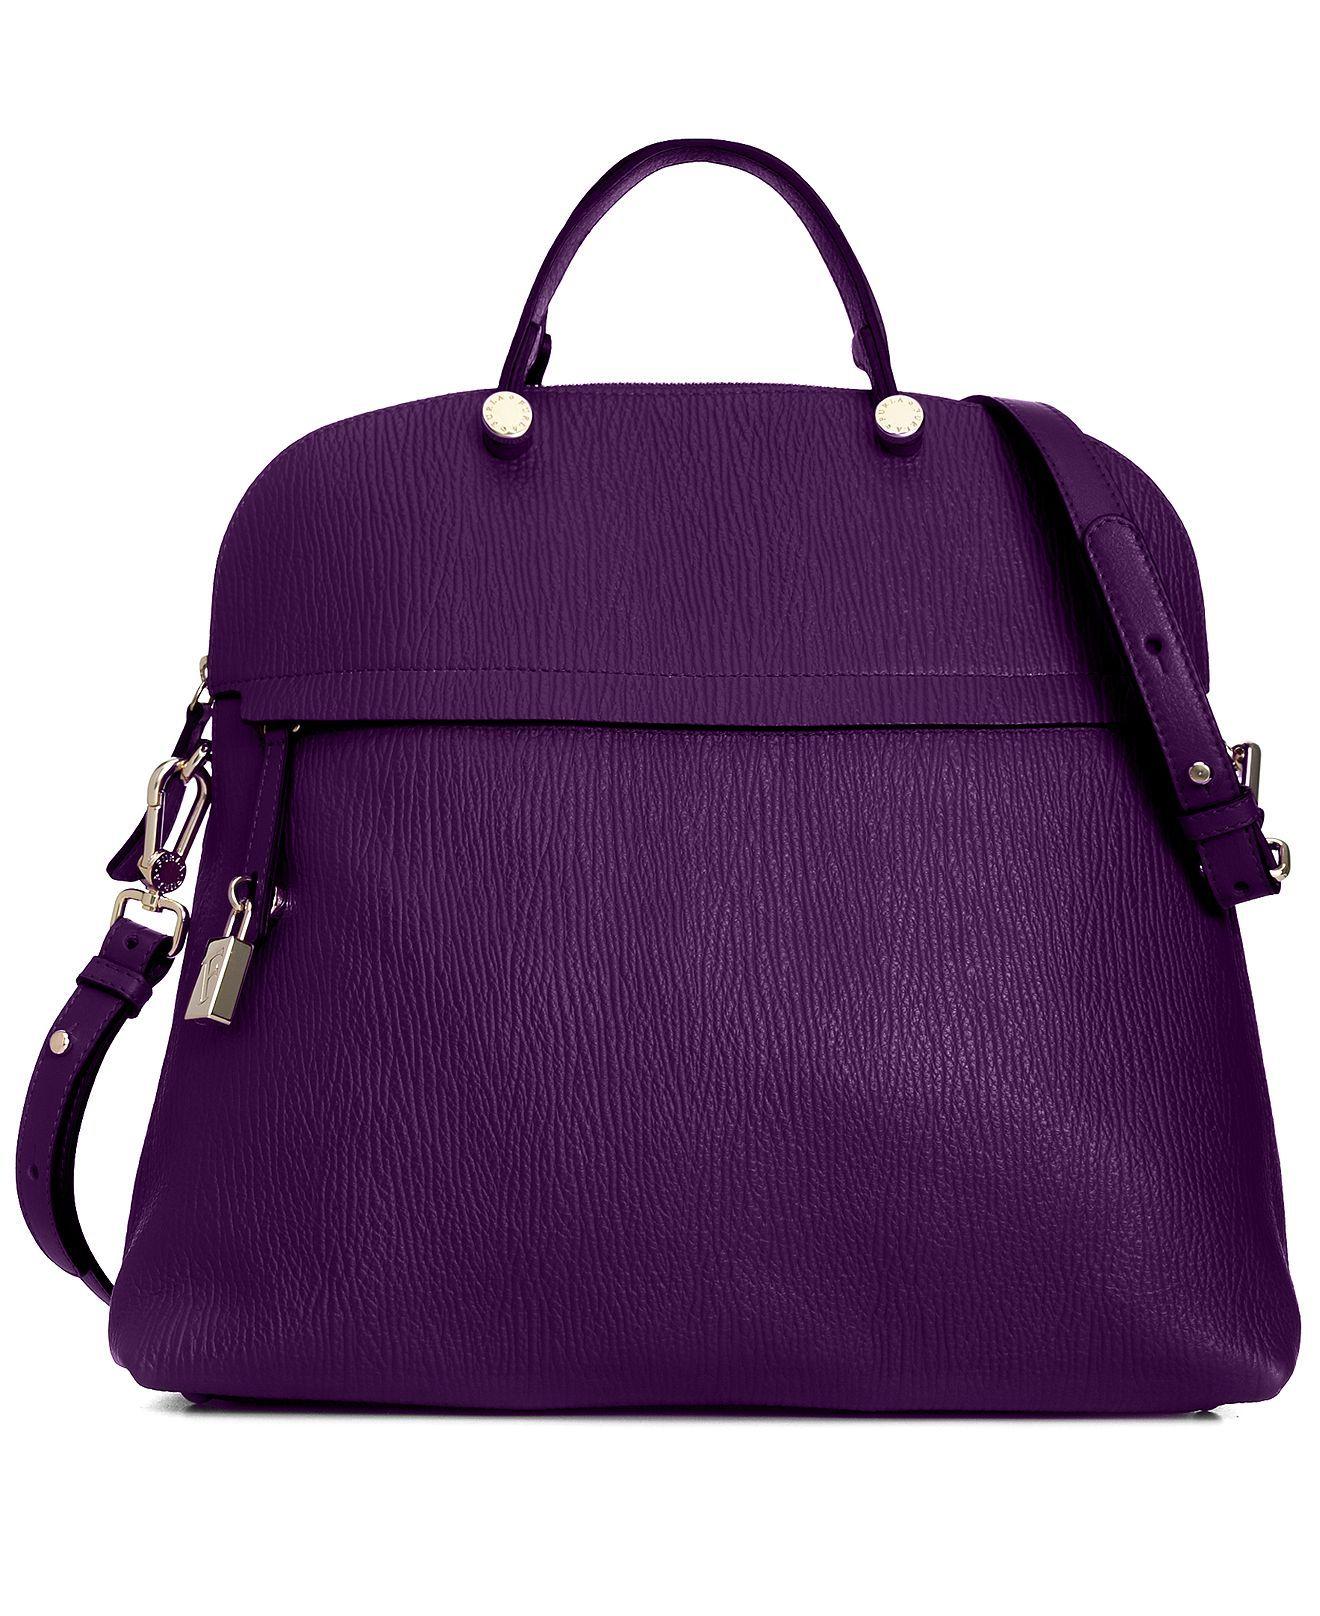 Furla Handbag, Piper Bugatti Medium Satchel - Handbags & Accessories -  Macy's